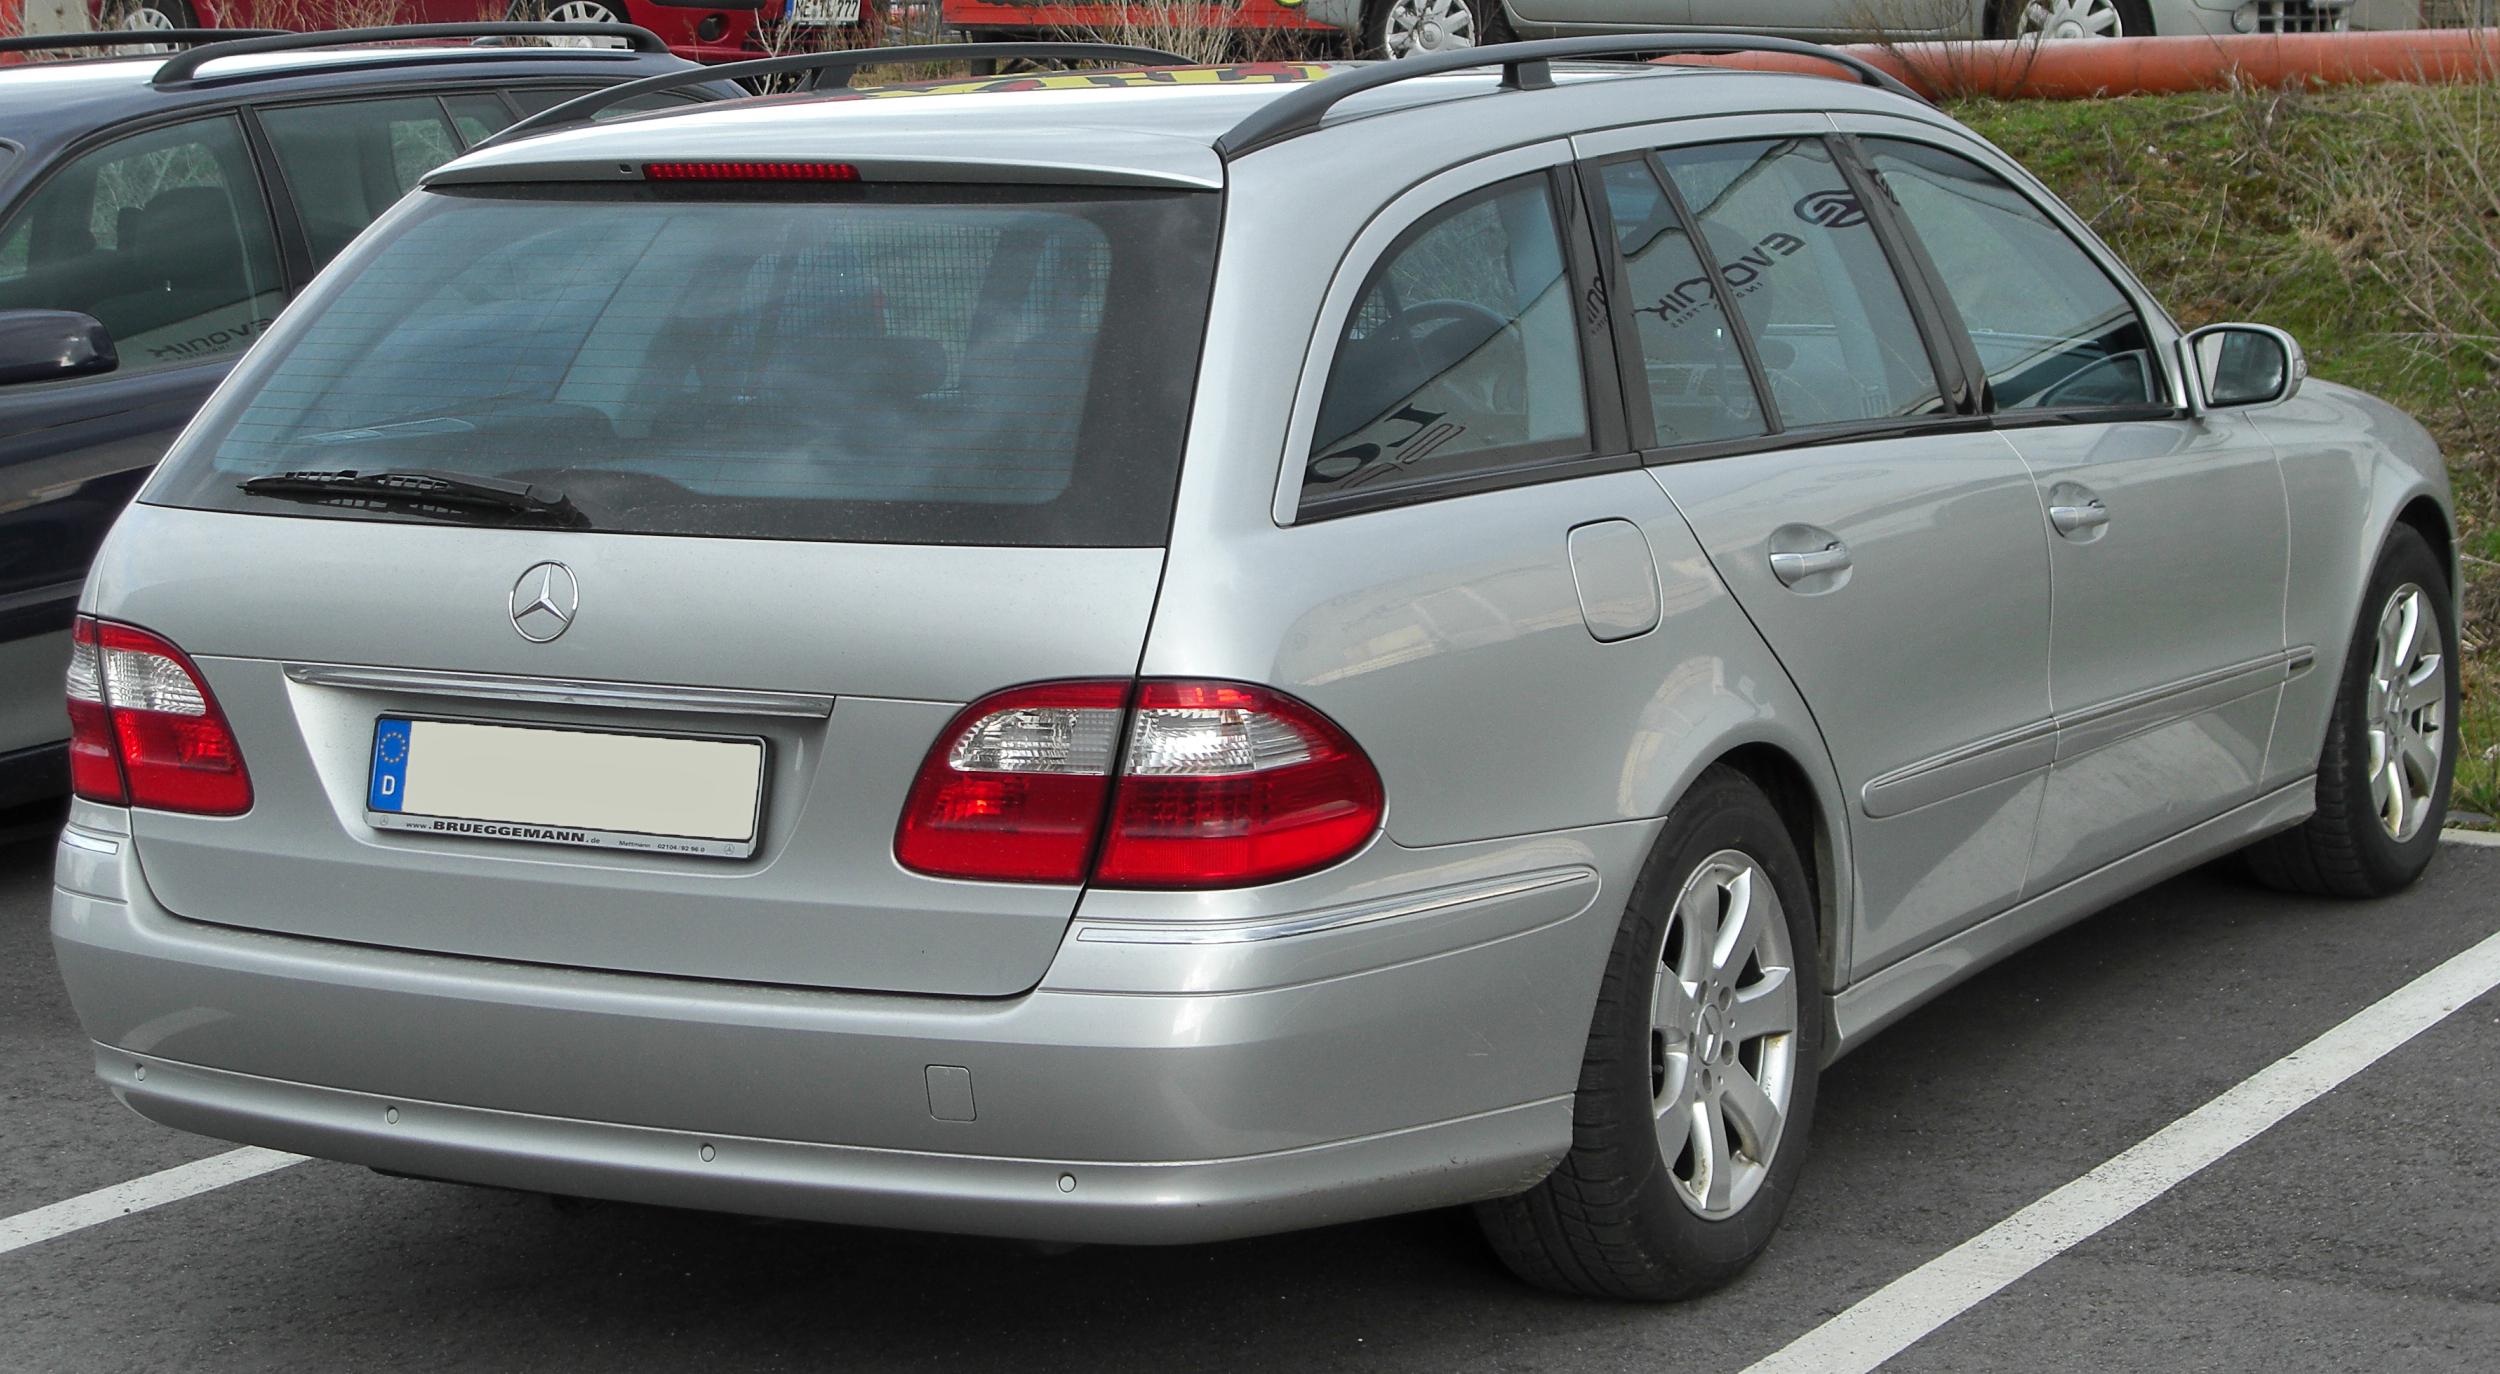 File:Mercedes E-Klasse T-Modell (S211) rear 20100327.jpg